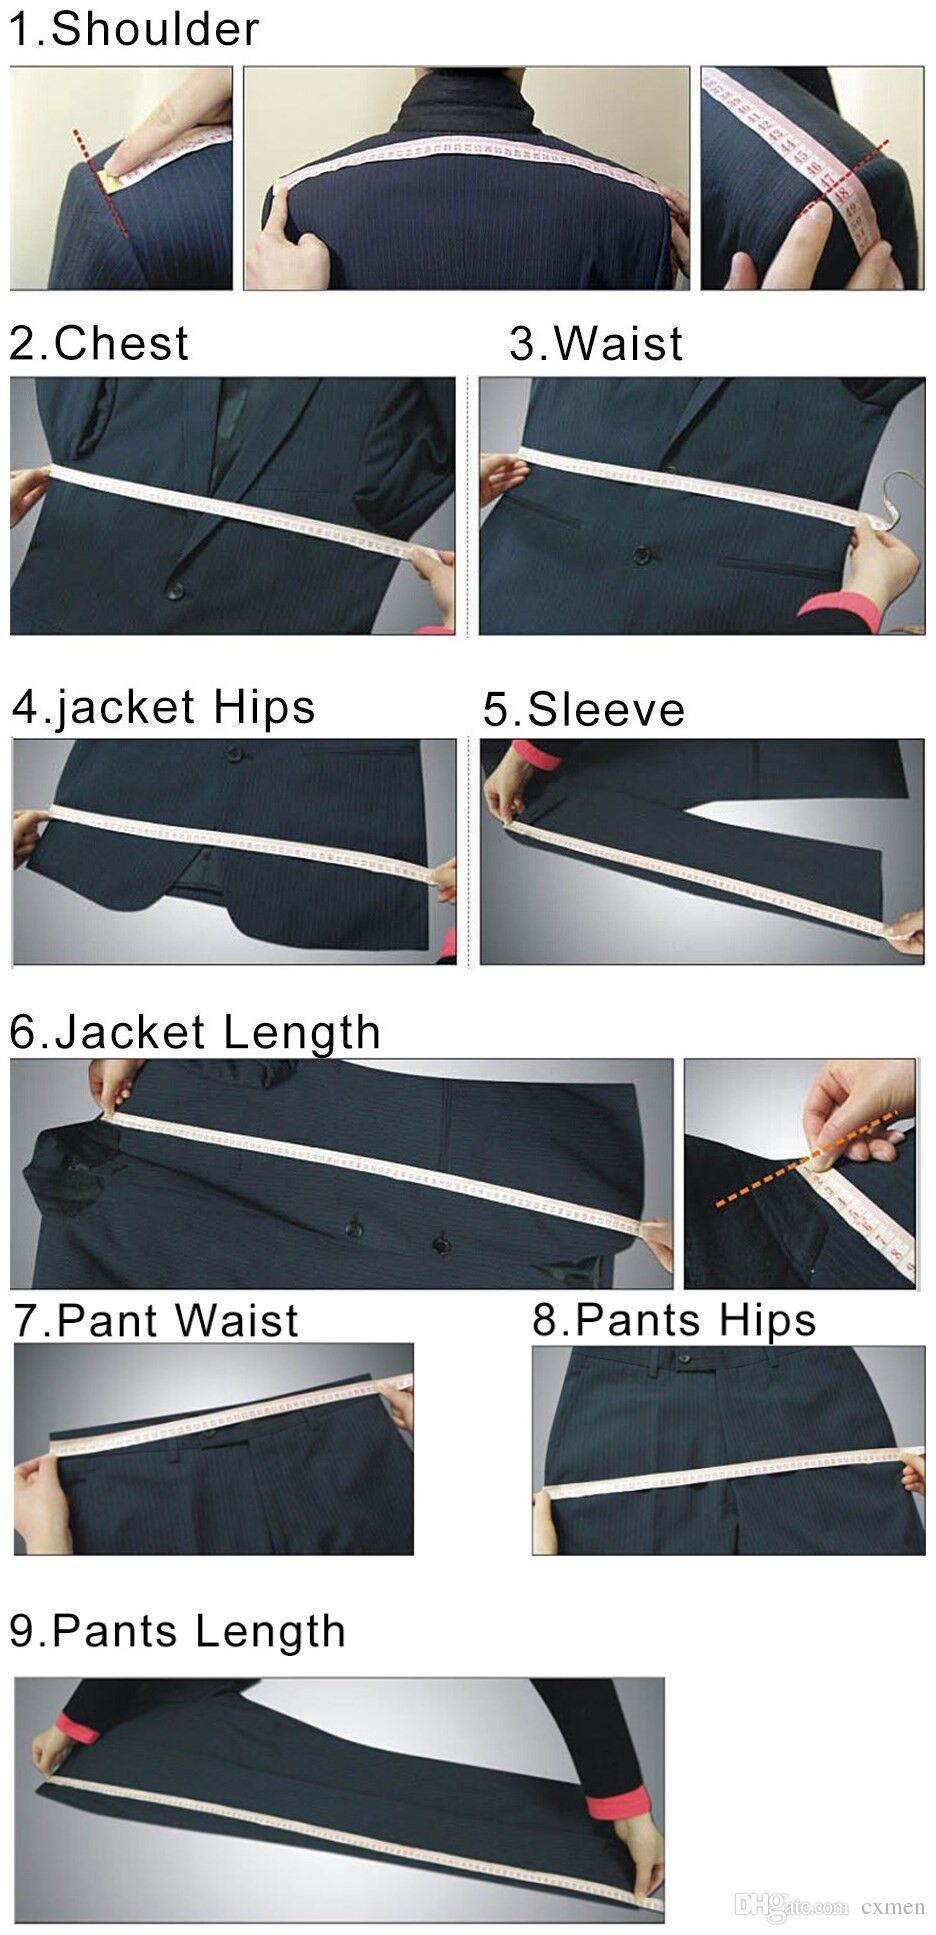 Gold Pattern Shawl Lapel Men Suits for Wedding Slim Fit Groom Tuxedos Handsome Best Men Blazers White Jacket Black Pants